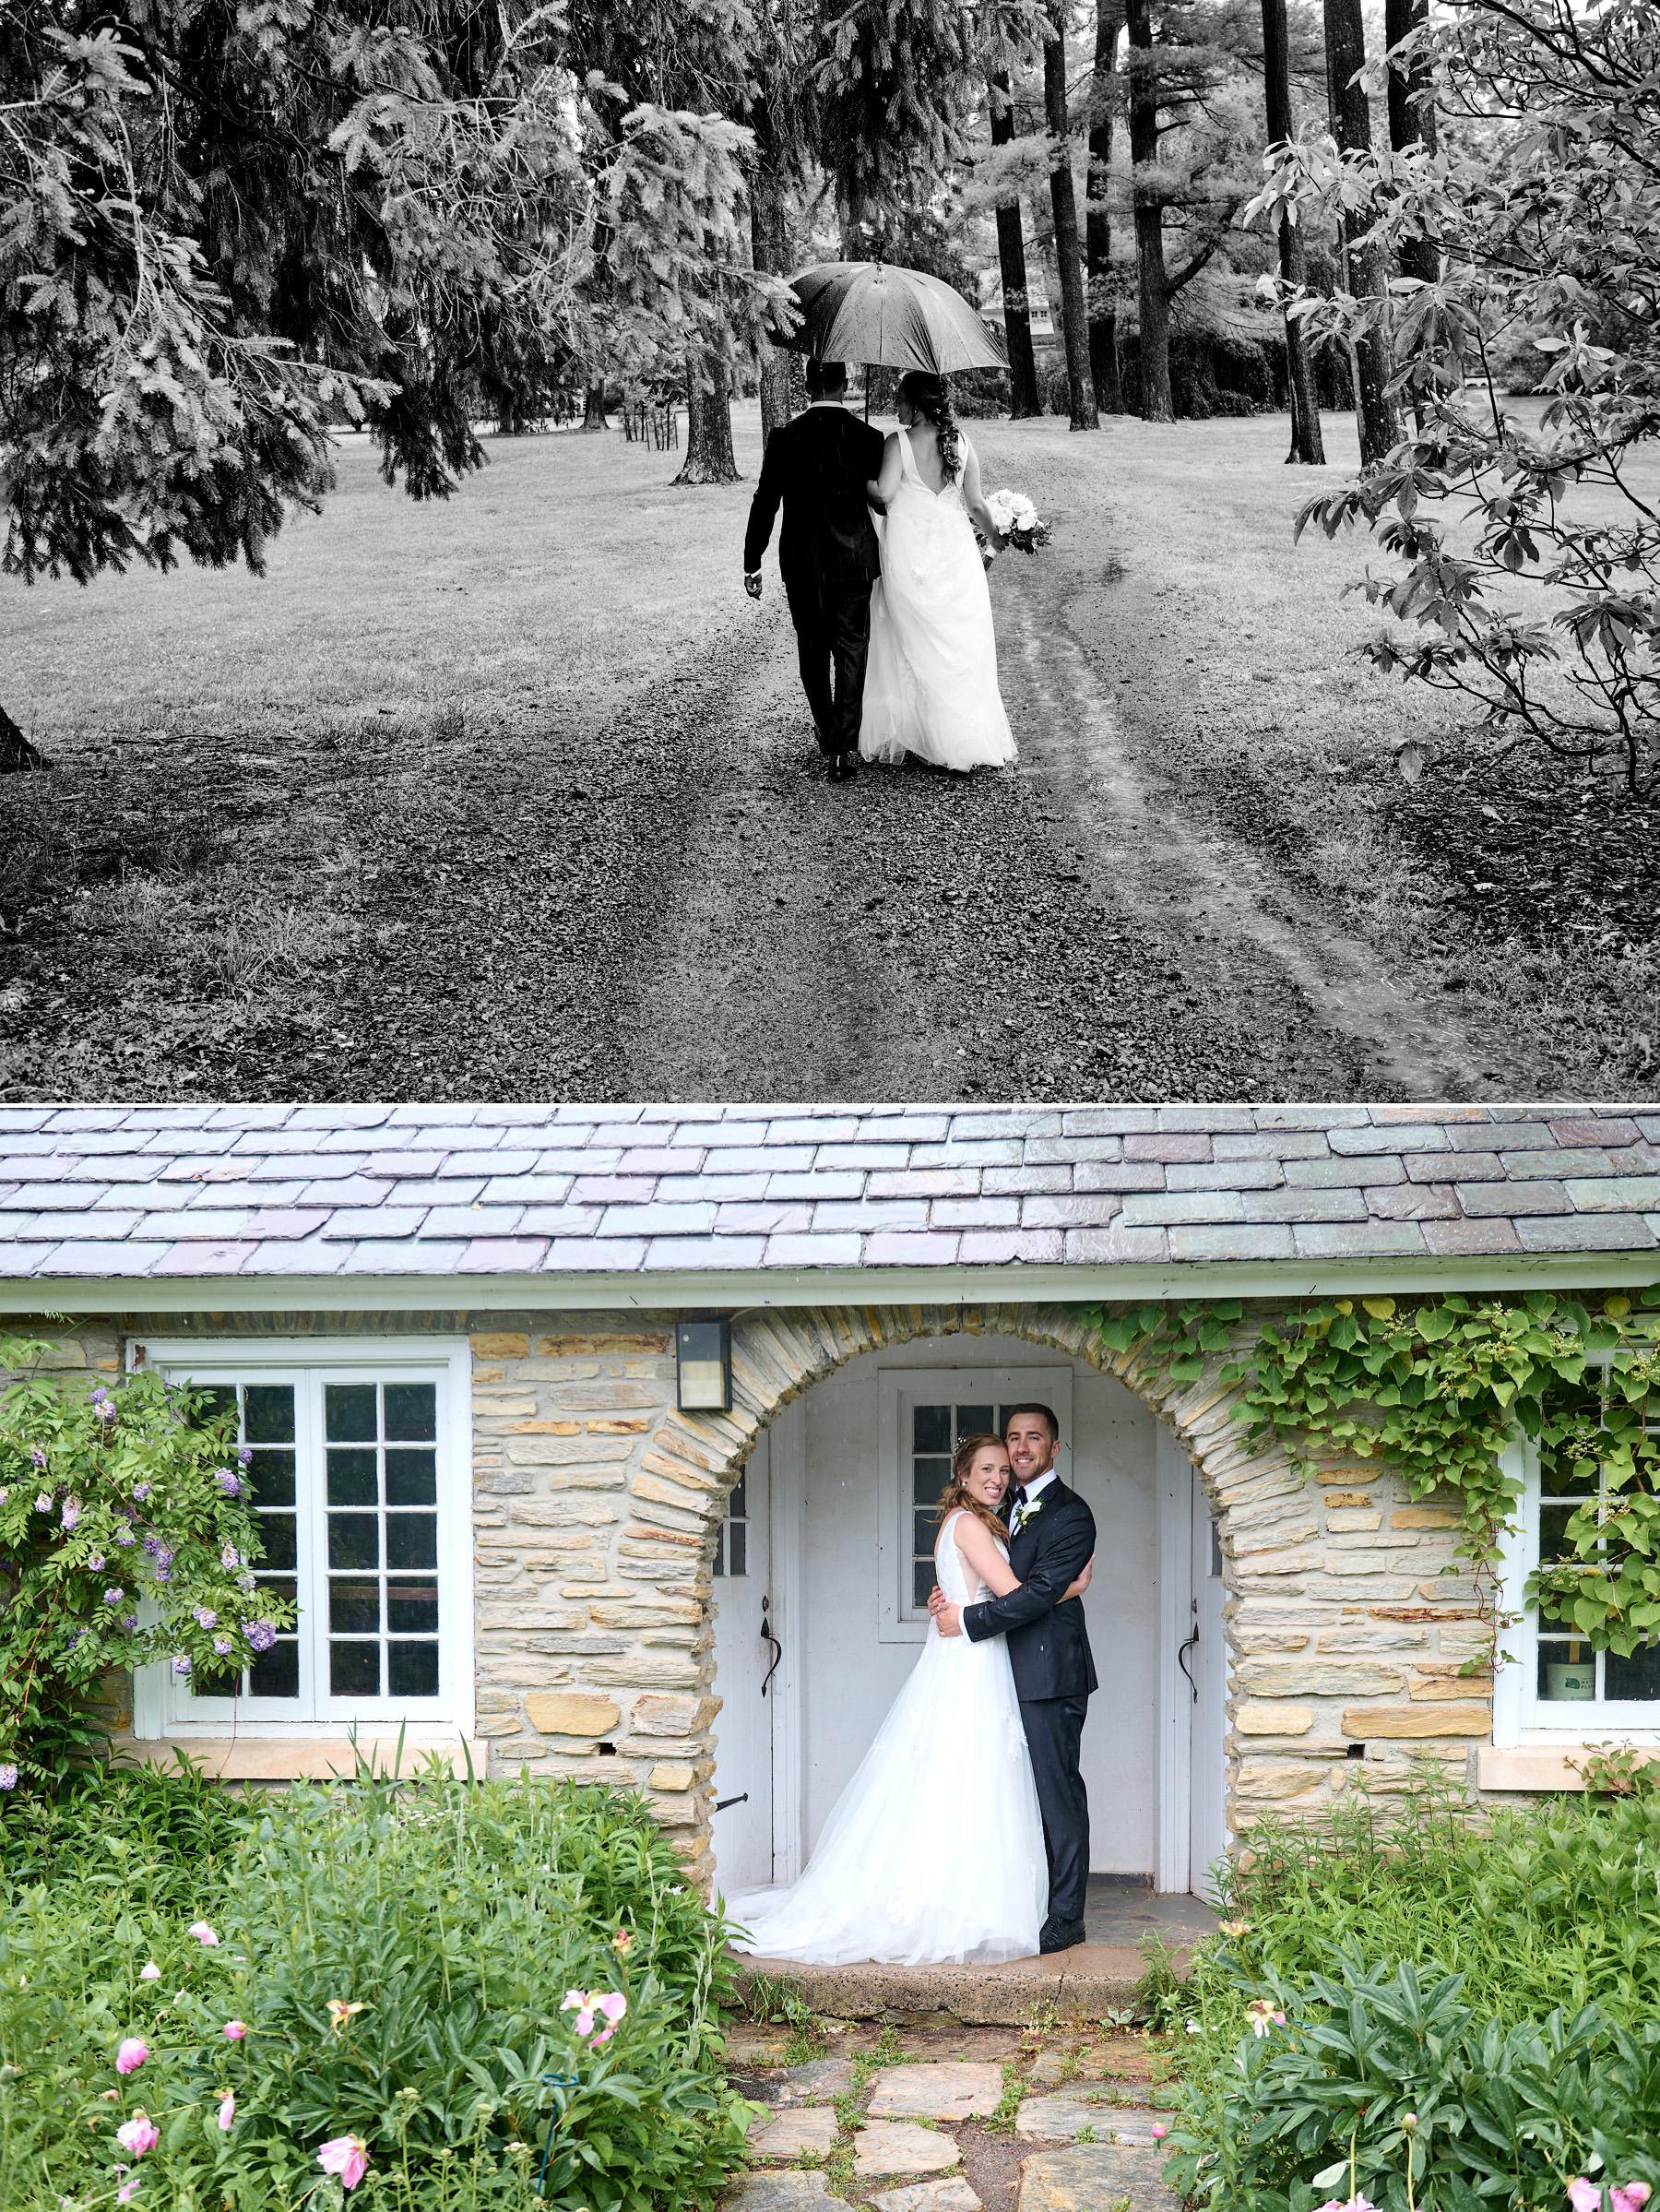 wedding photos at colonial park